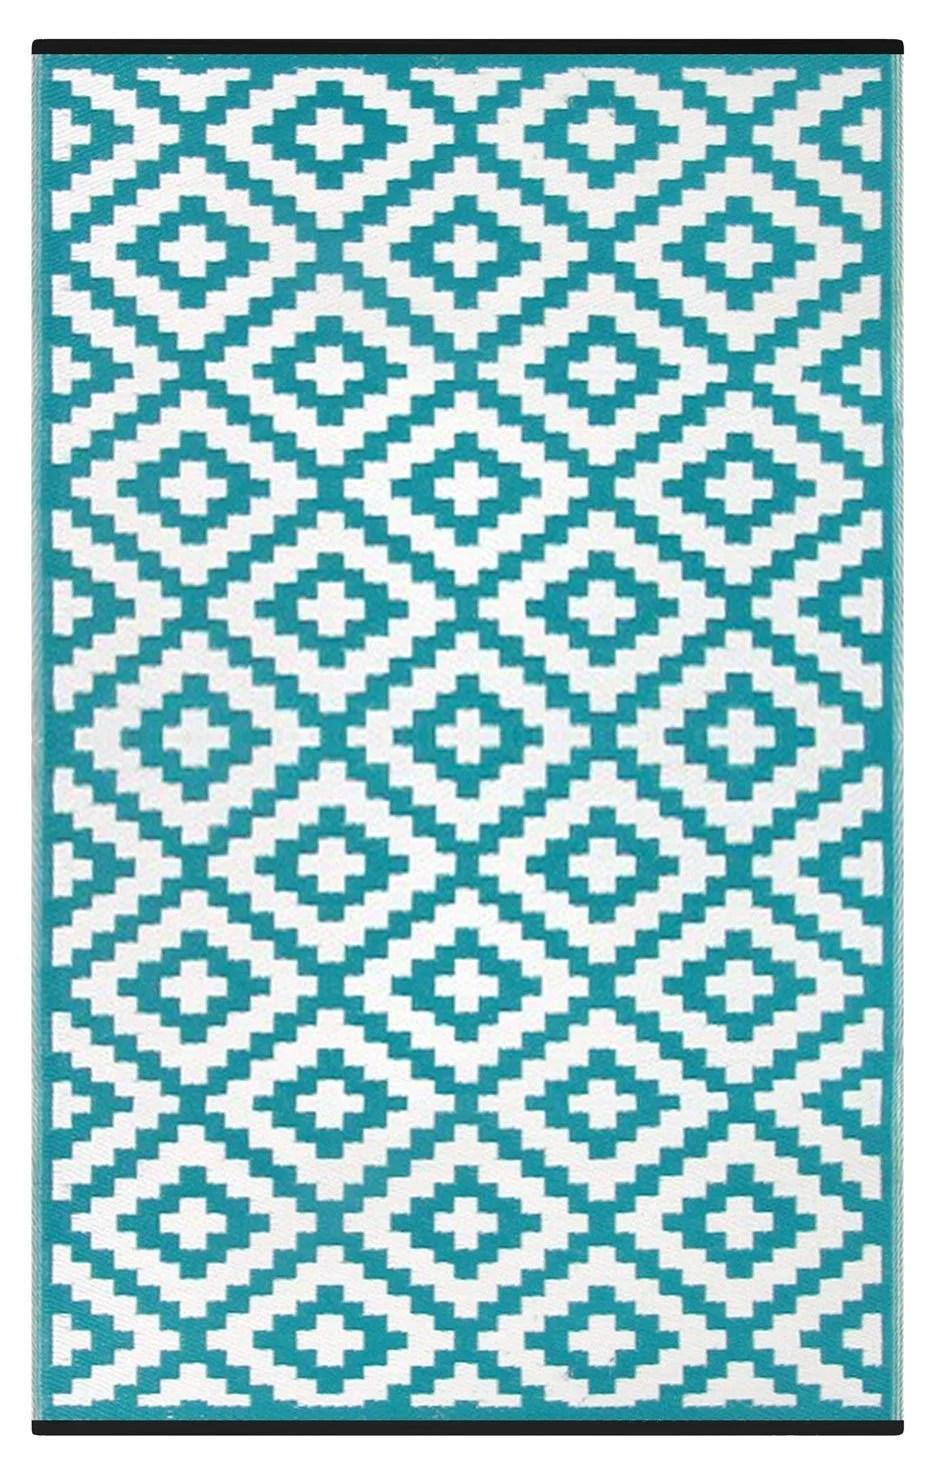 lightweight outdoor reversible plastic nirvana rug 4 x 6 teal blue white